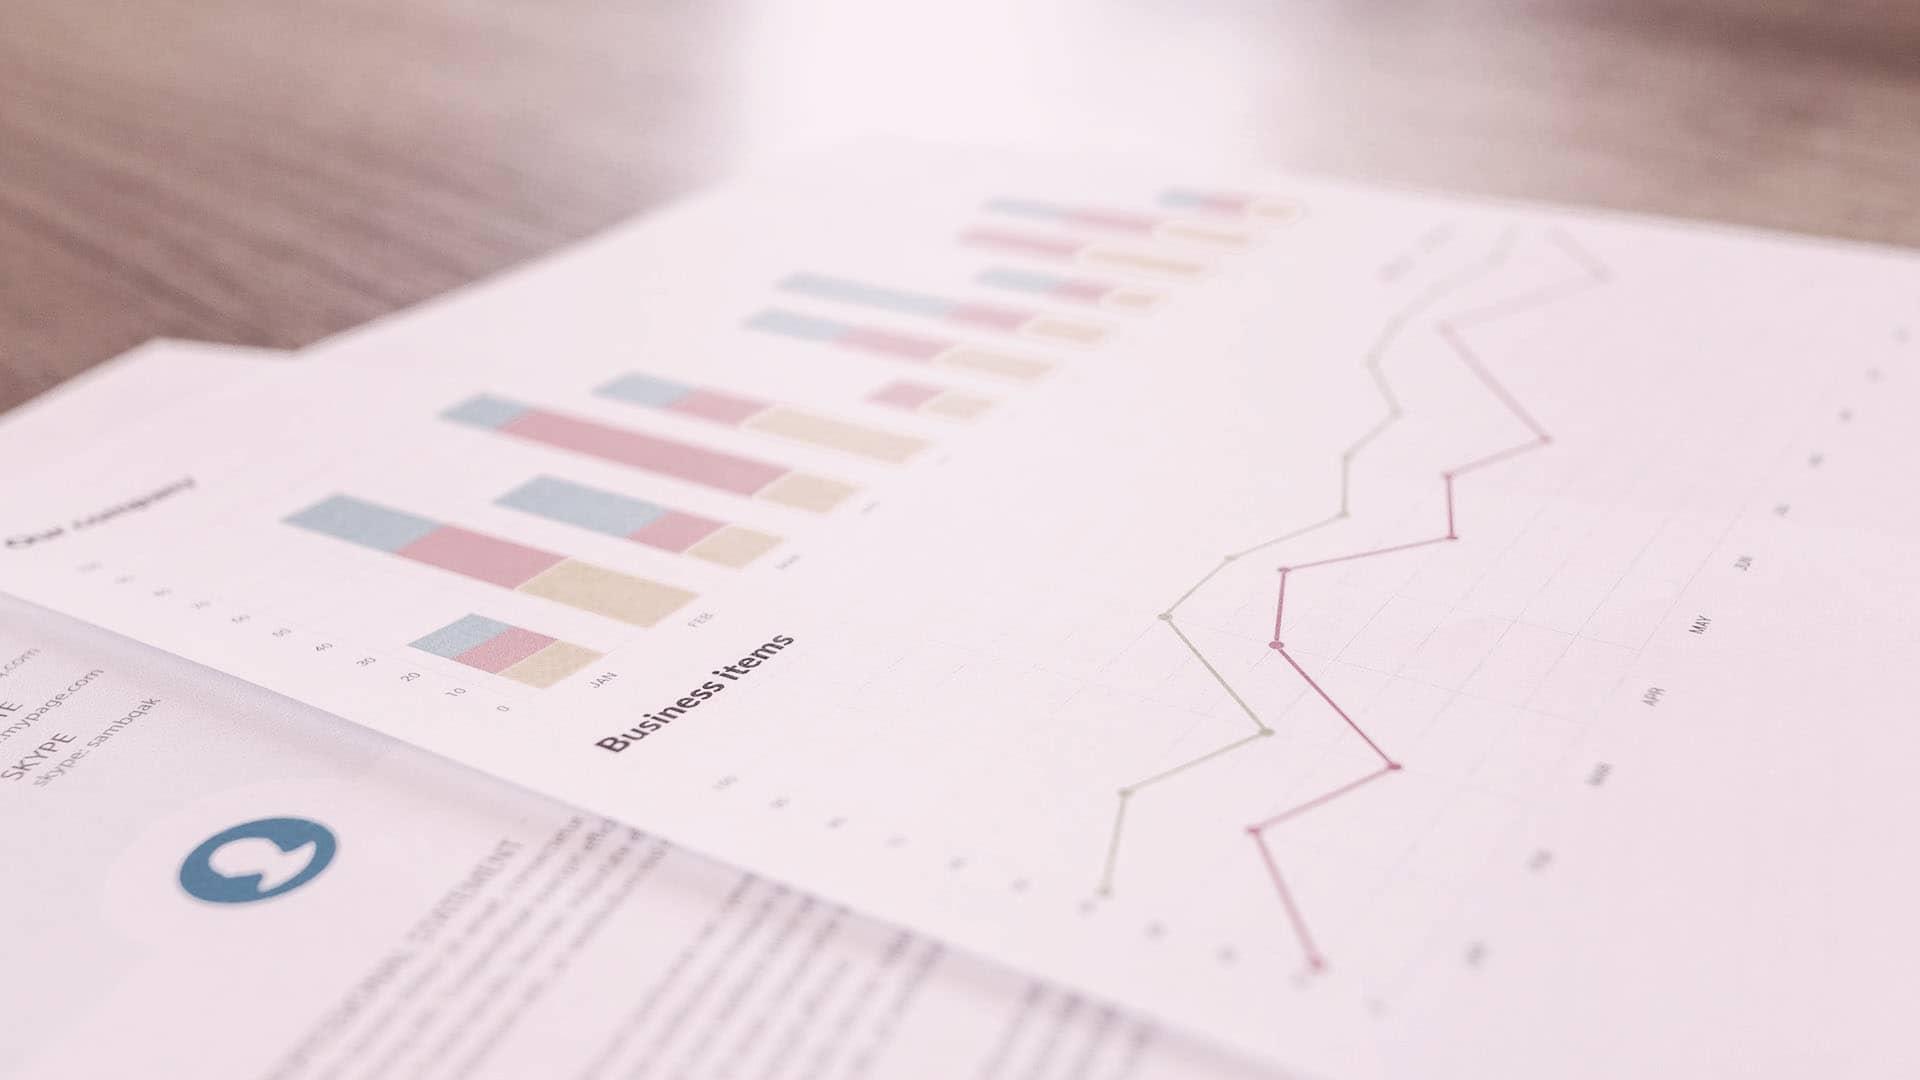 Confianza Online en cifras: Balance del primer semestre de 2021